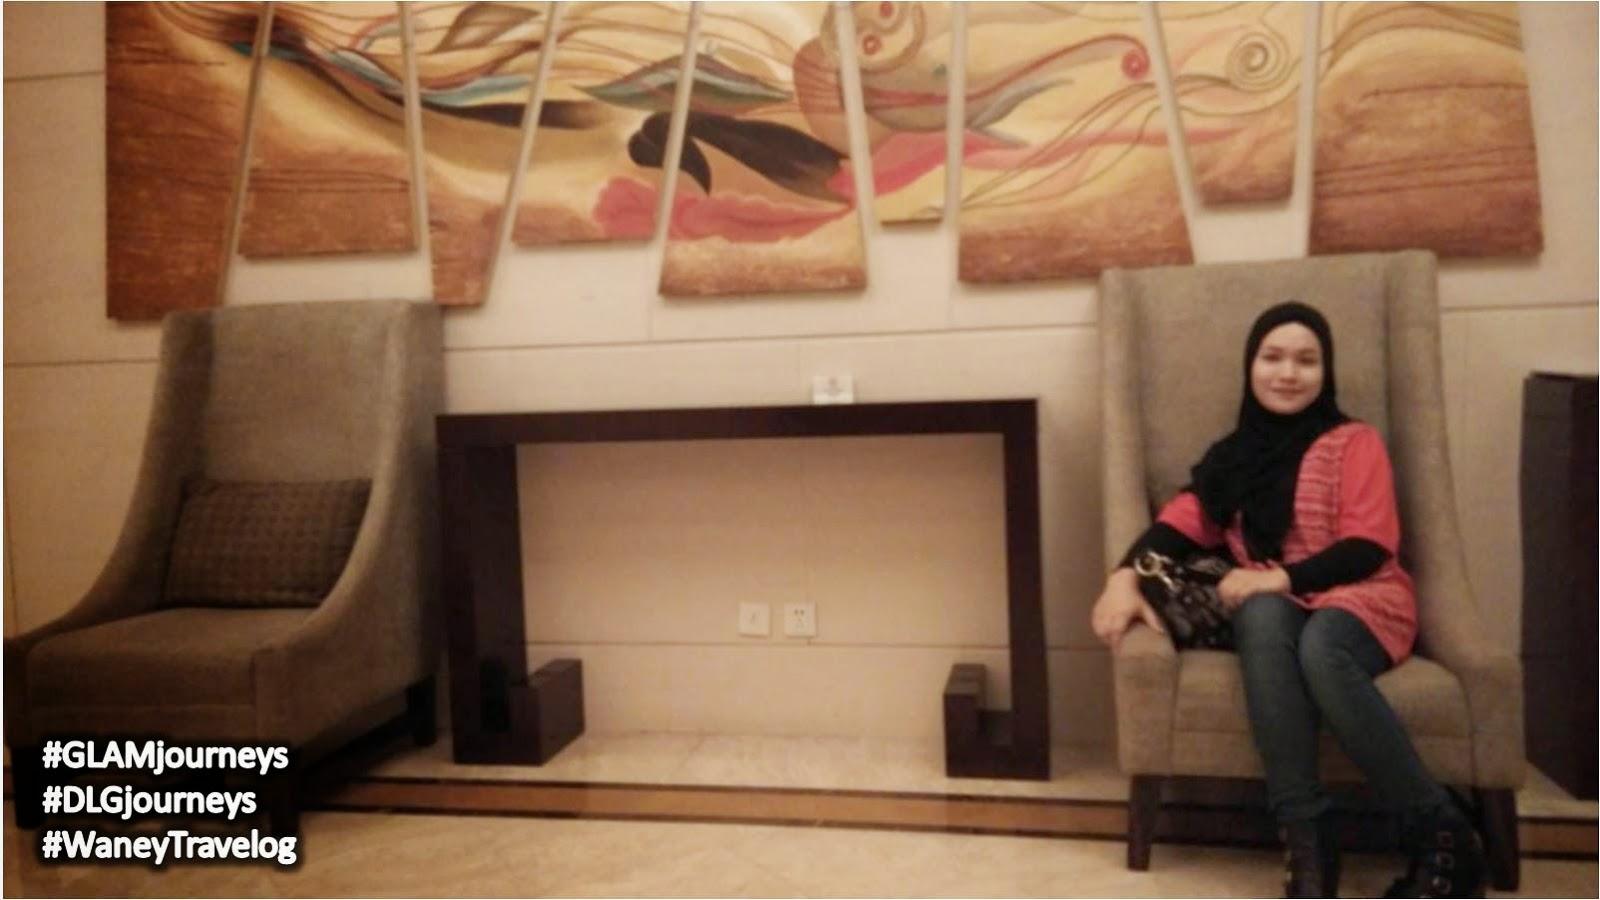 The Bund Shanghai, melancong ke Shanghai, must visit places in Shanghai, tour guide in Shanghai, pakej melancong ke Shanghai, holiday package Shanghai, cuti-cuti Malaysia, Huangpu River, Oriental Pearl Tower, Shanghai Tower, Shanghai World Financial Tower, Glam journeys, DLG Journeys, Glampreneur, Dynamic Leaders group, Waney Travelog, Waney in Shanghai, Waney Zainuddin, Premium Beautiful Business, peluang perniagaan 2014